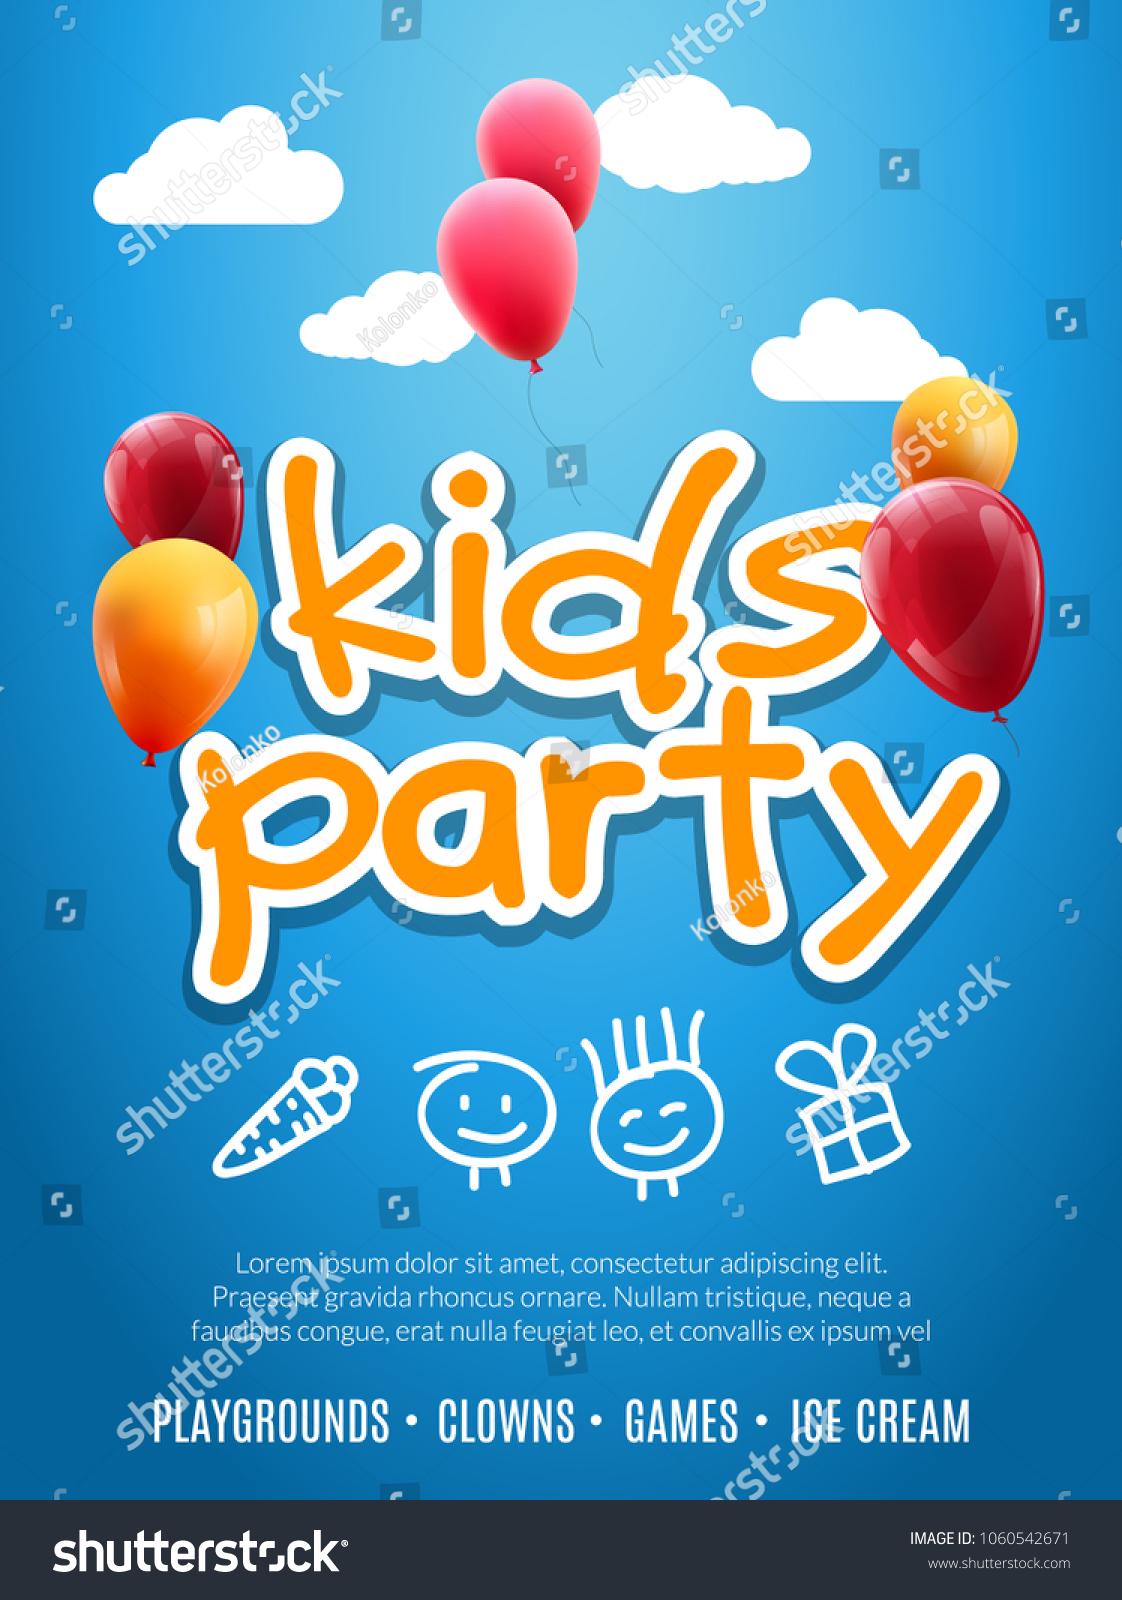 kids party invitation design template child のベクター画像素材